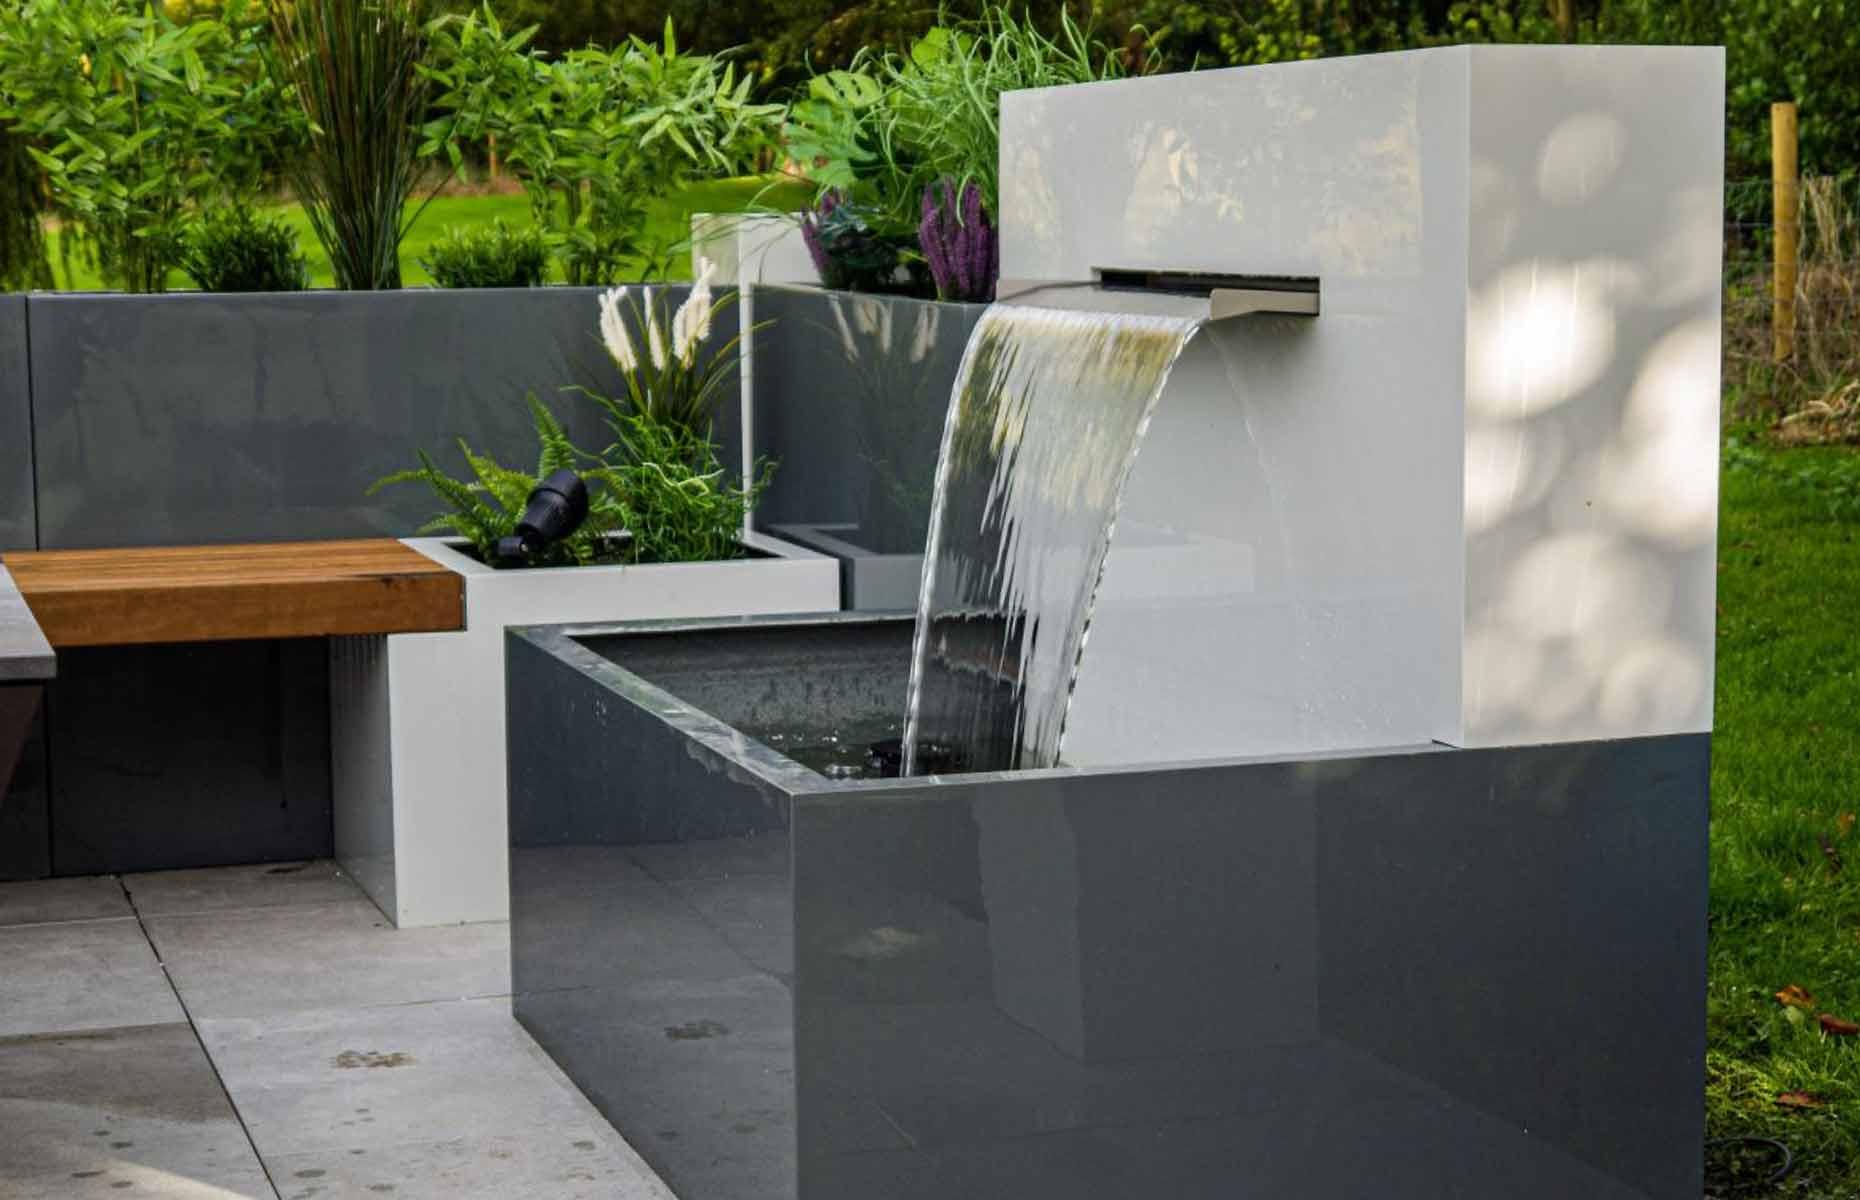 Image: Garden Vision